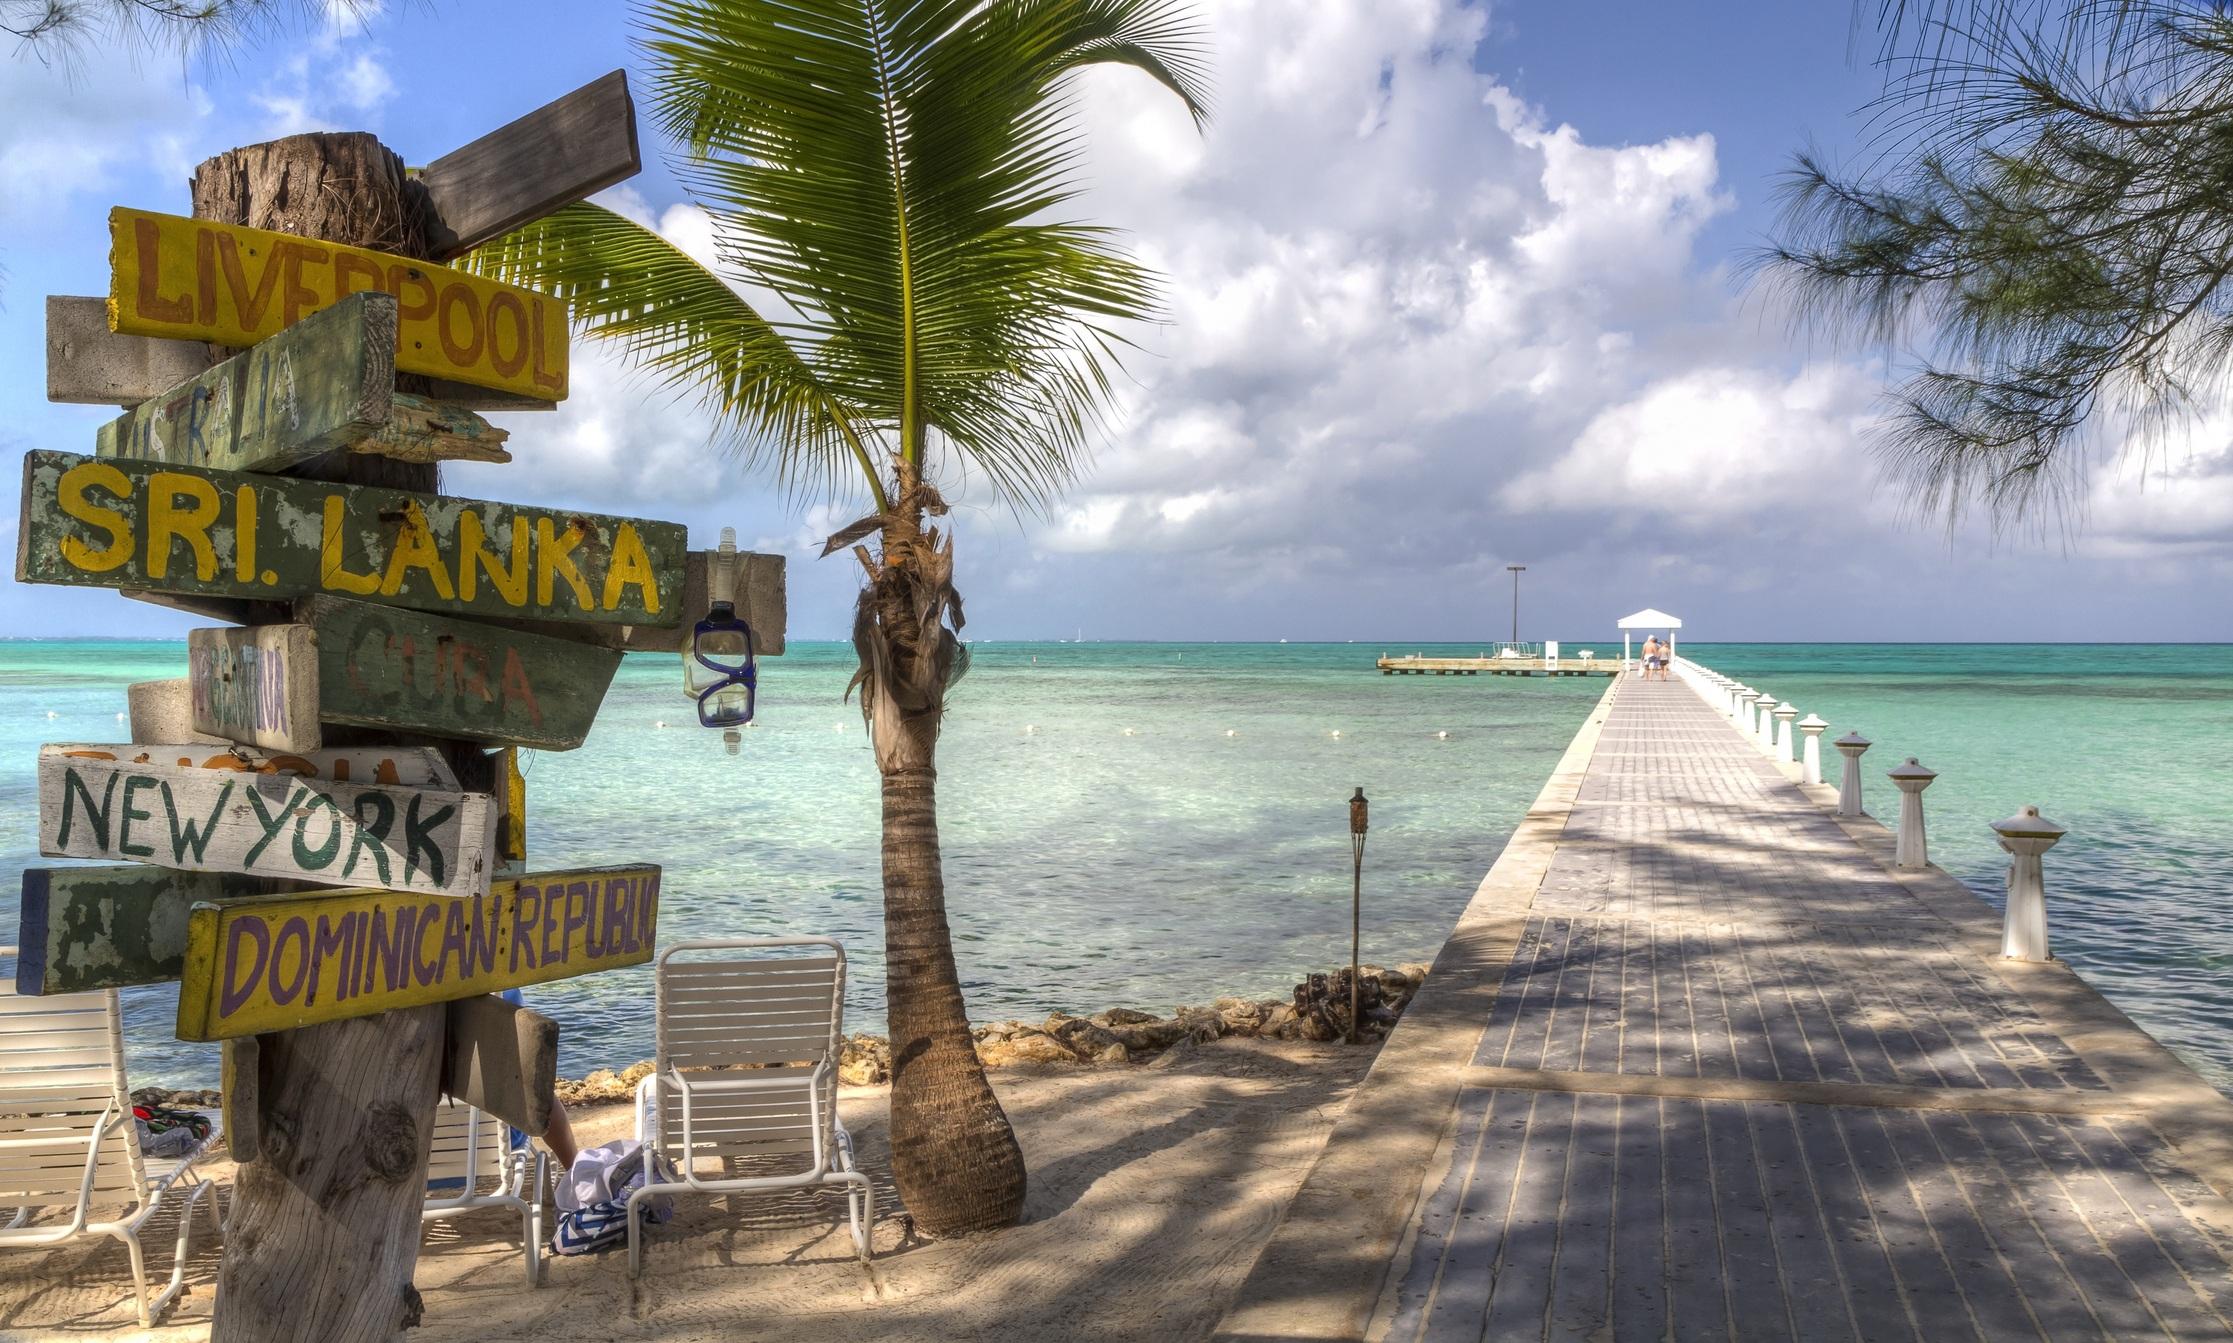 Grand Cayman islands